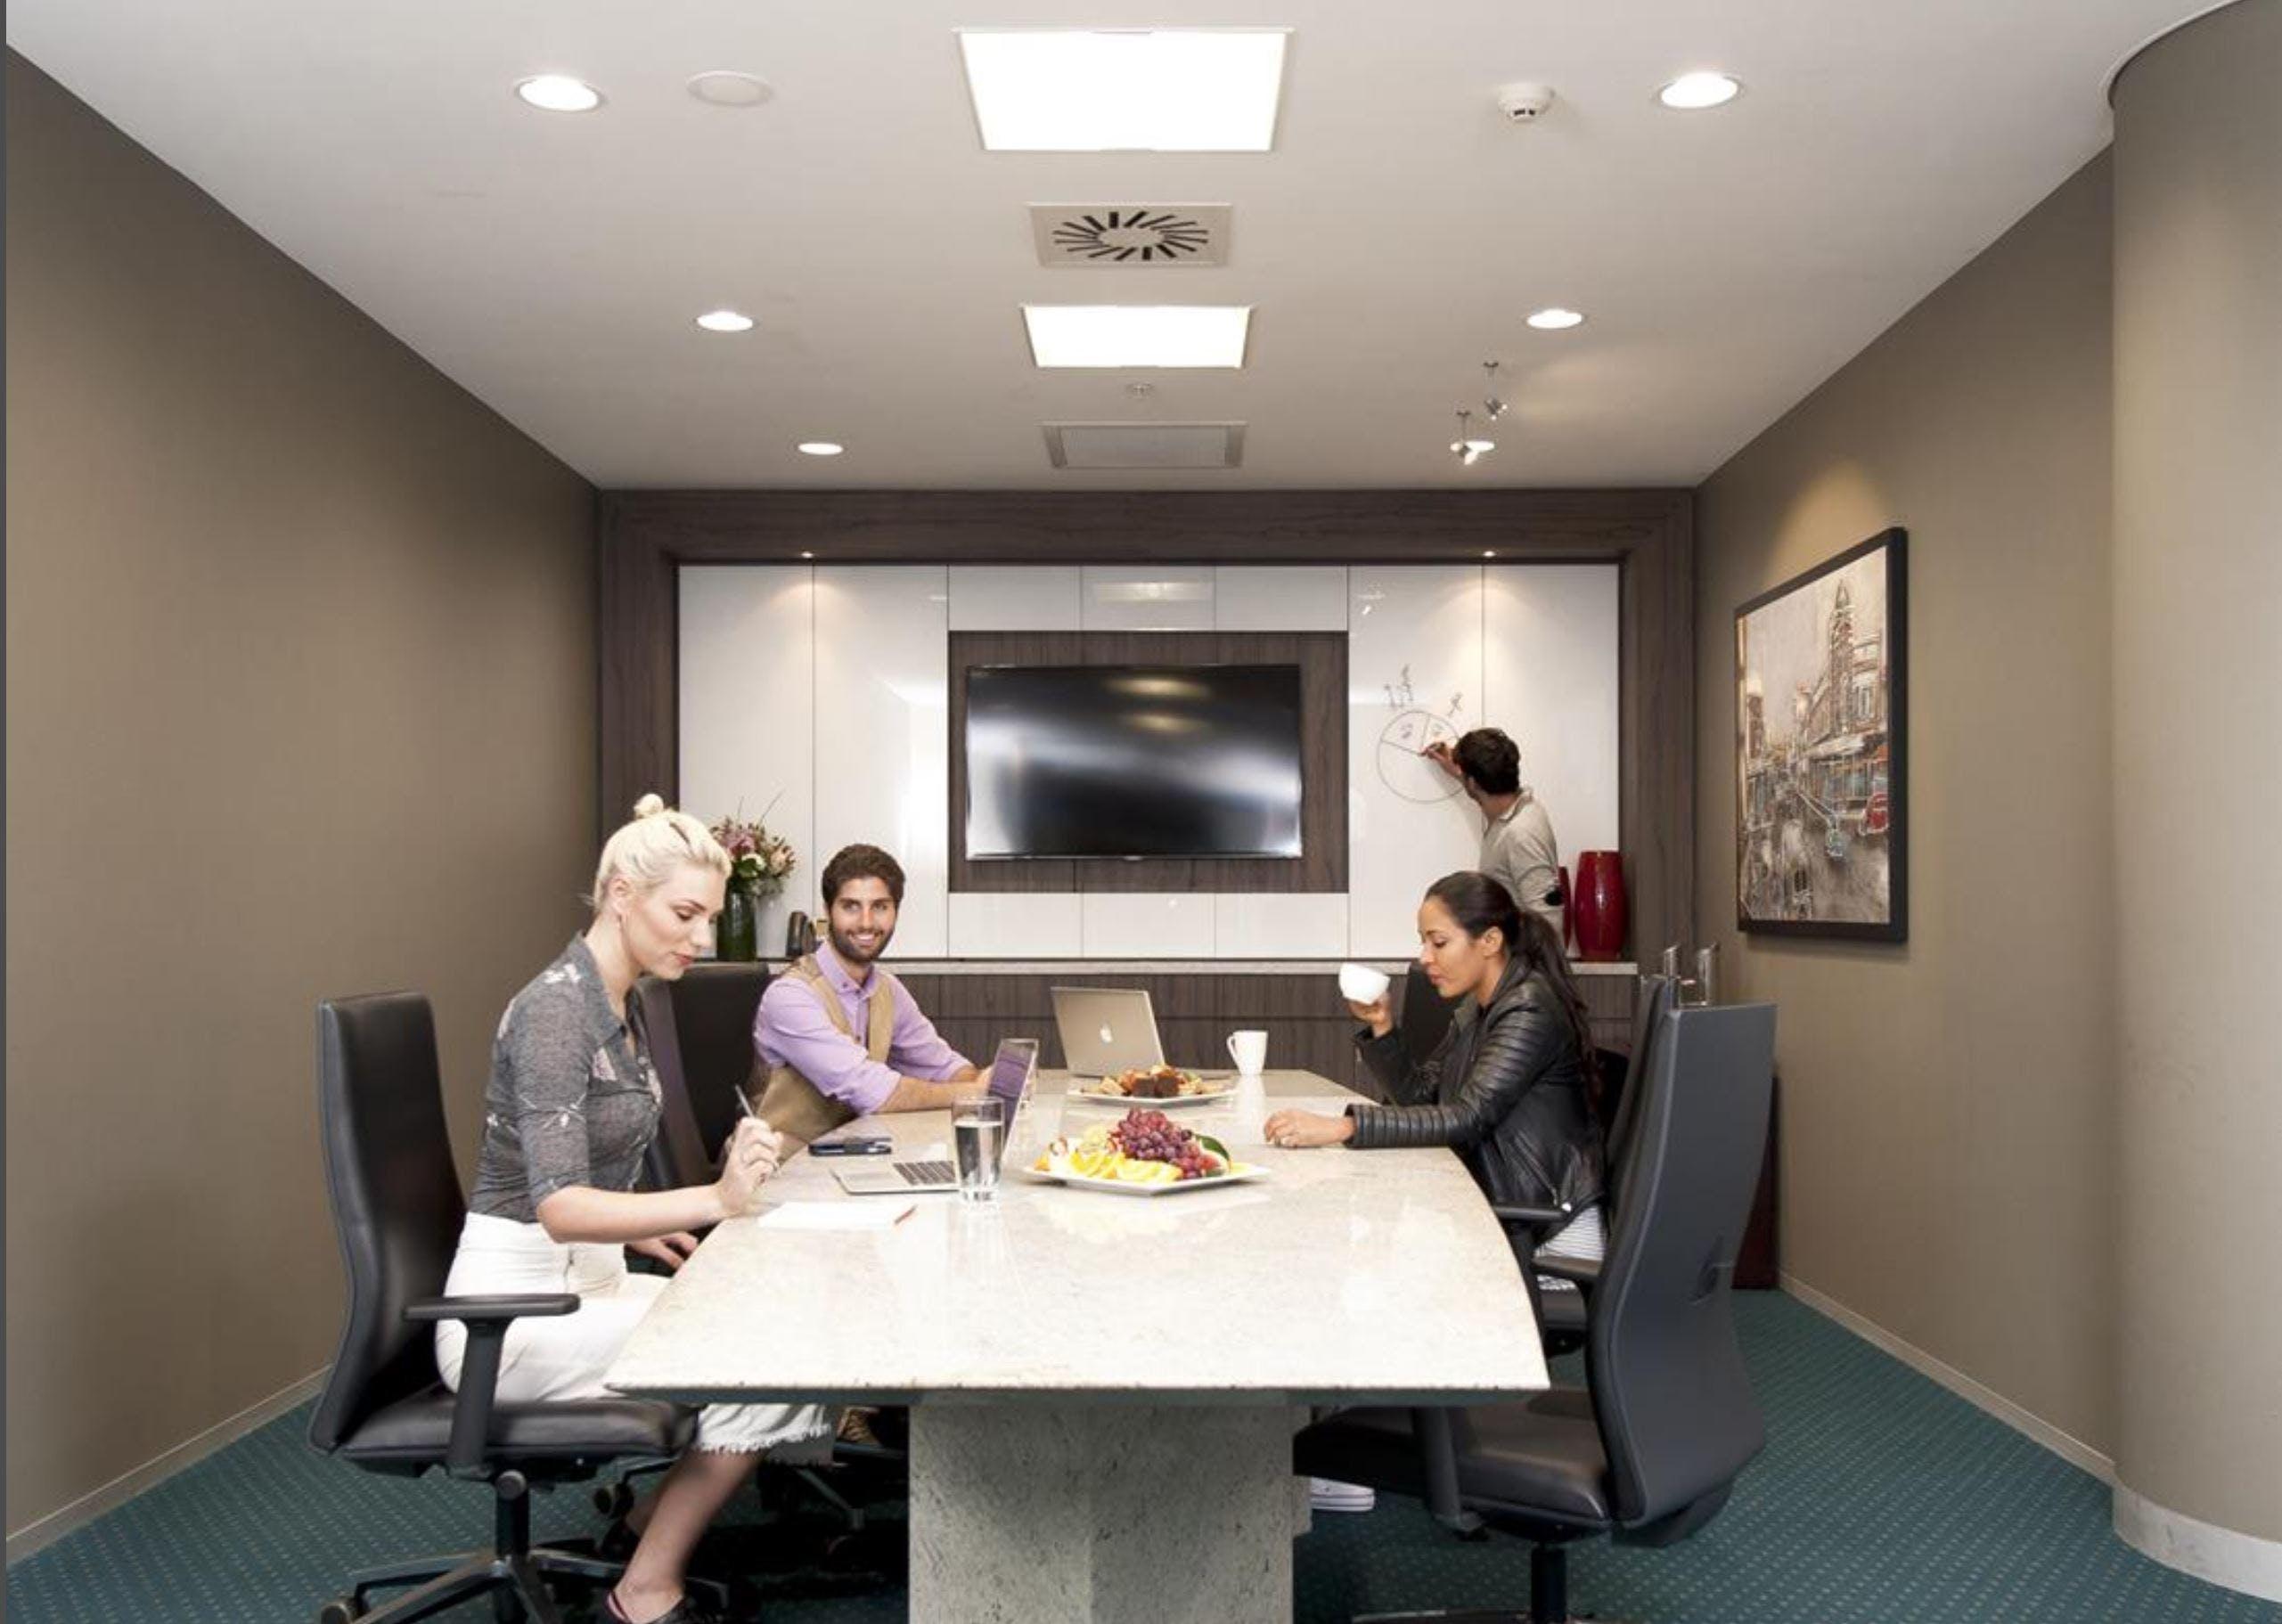 Premium Boardroom, meeting room at Avaya House, image 1